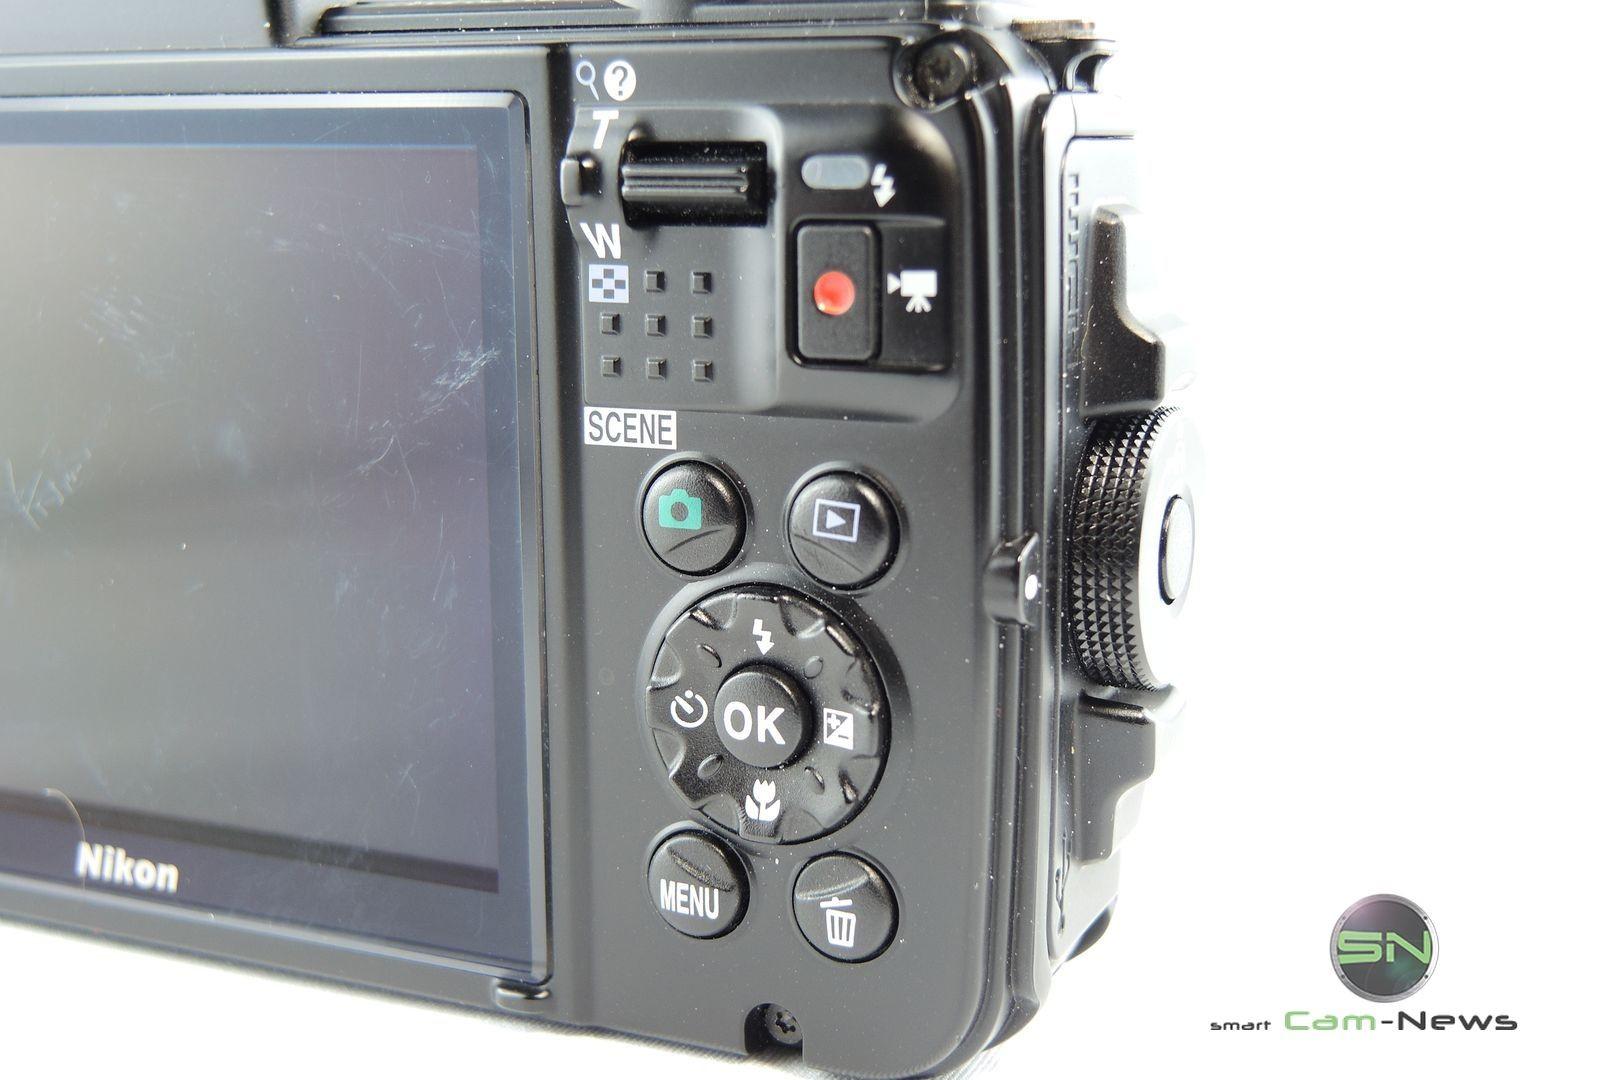 Bedienelemente Rückseite Nikon AW130 - SmartCamNews